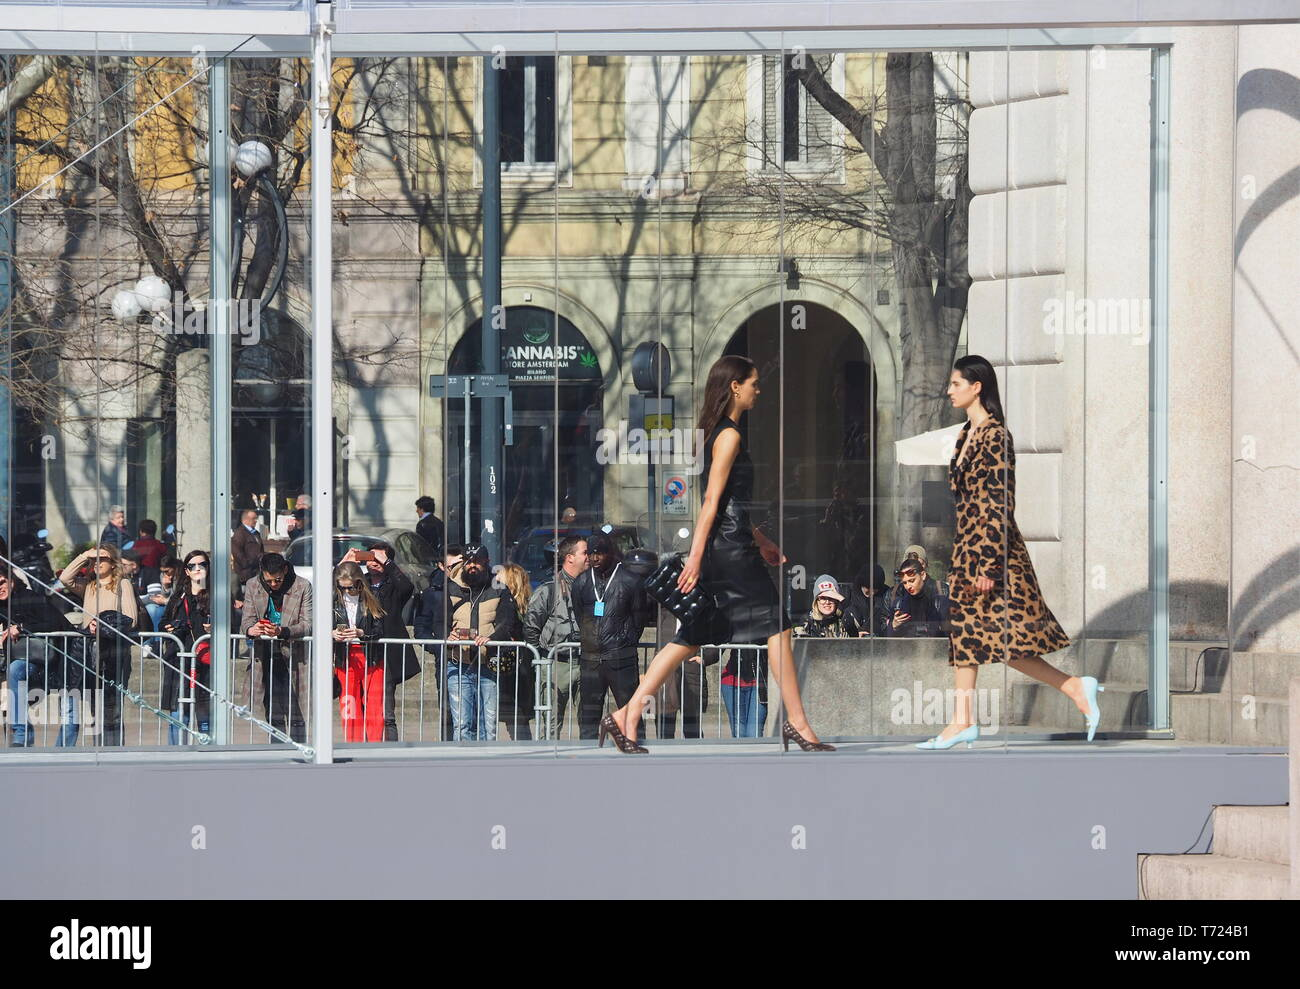 MILAN, Italy: 22 February 2019: Models walk the runway at Bottega veneta fashion show during MFW fall/winter 2019 - Stock Image